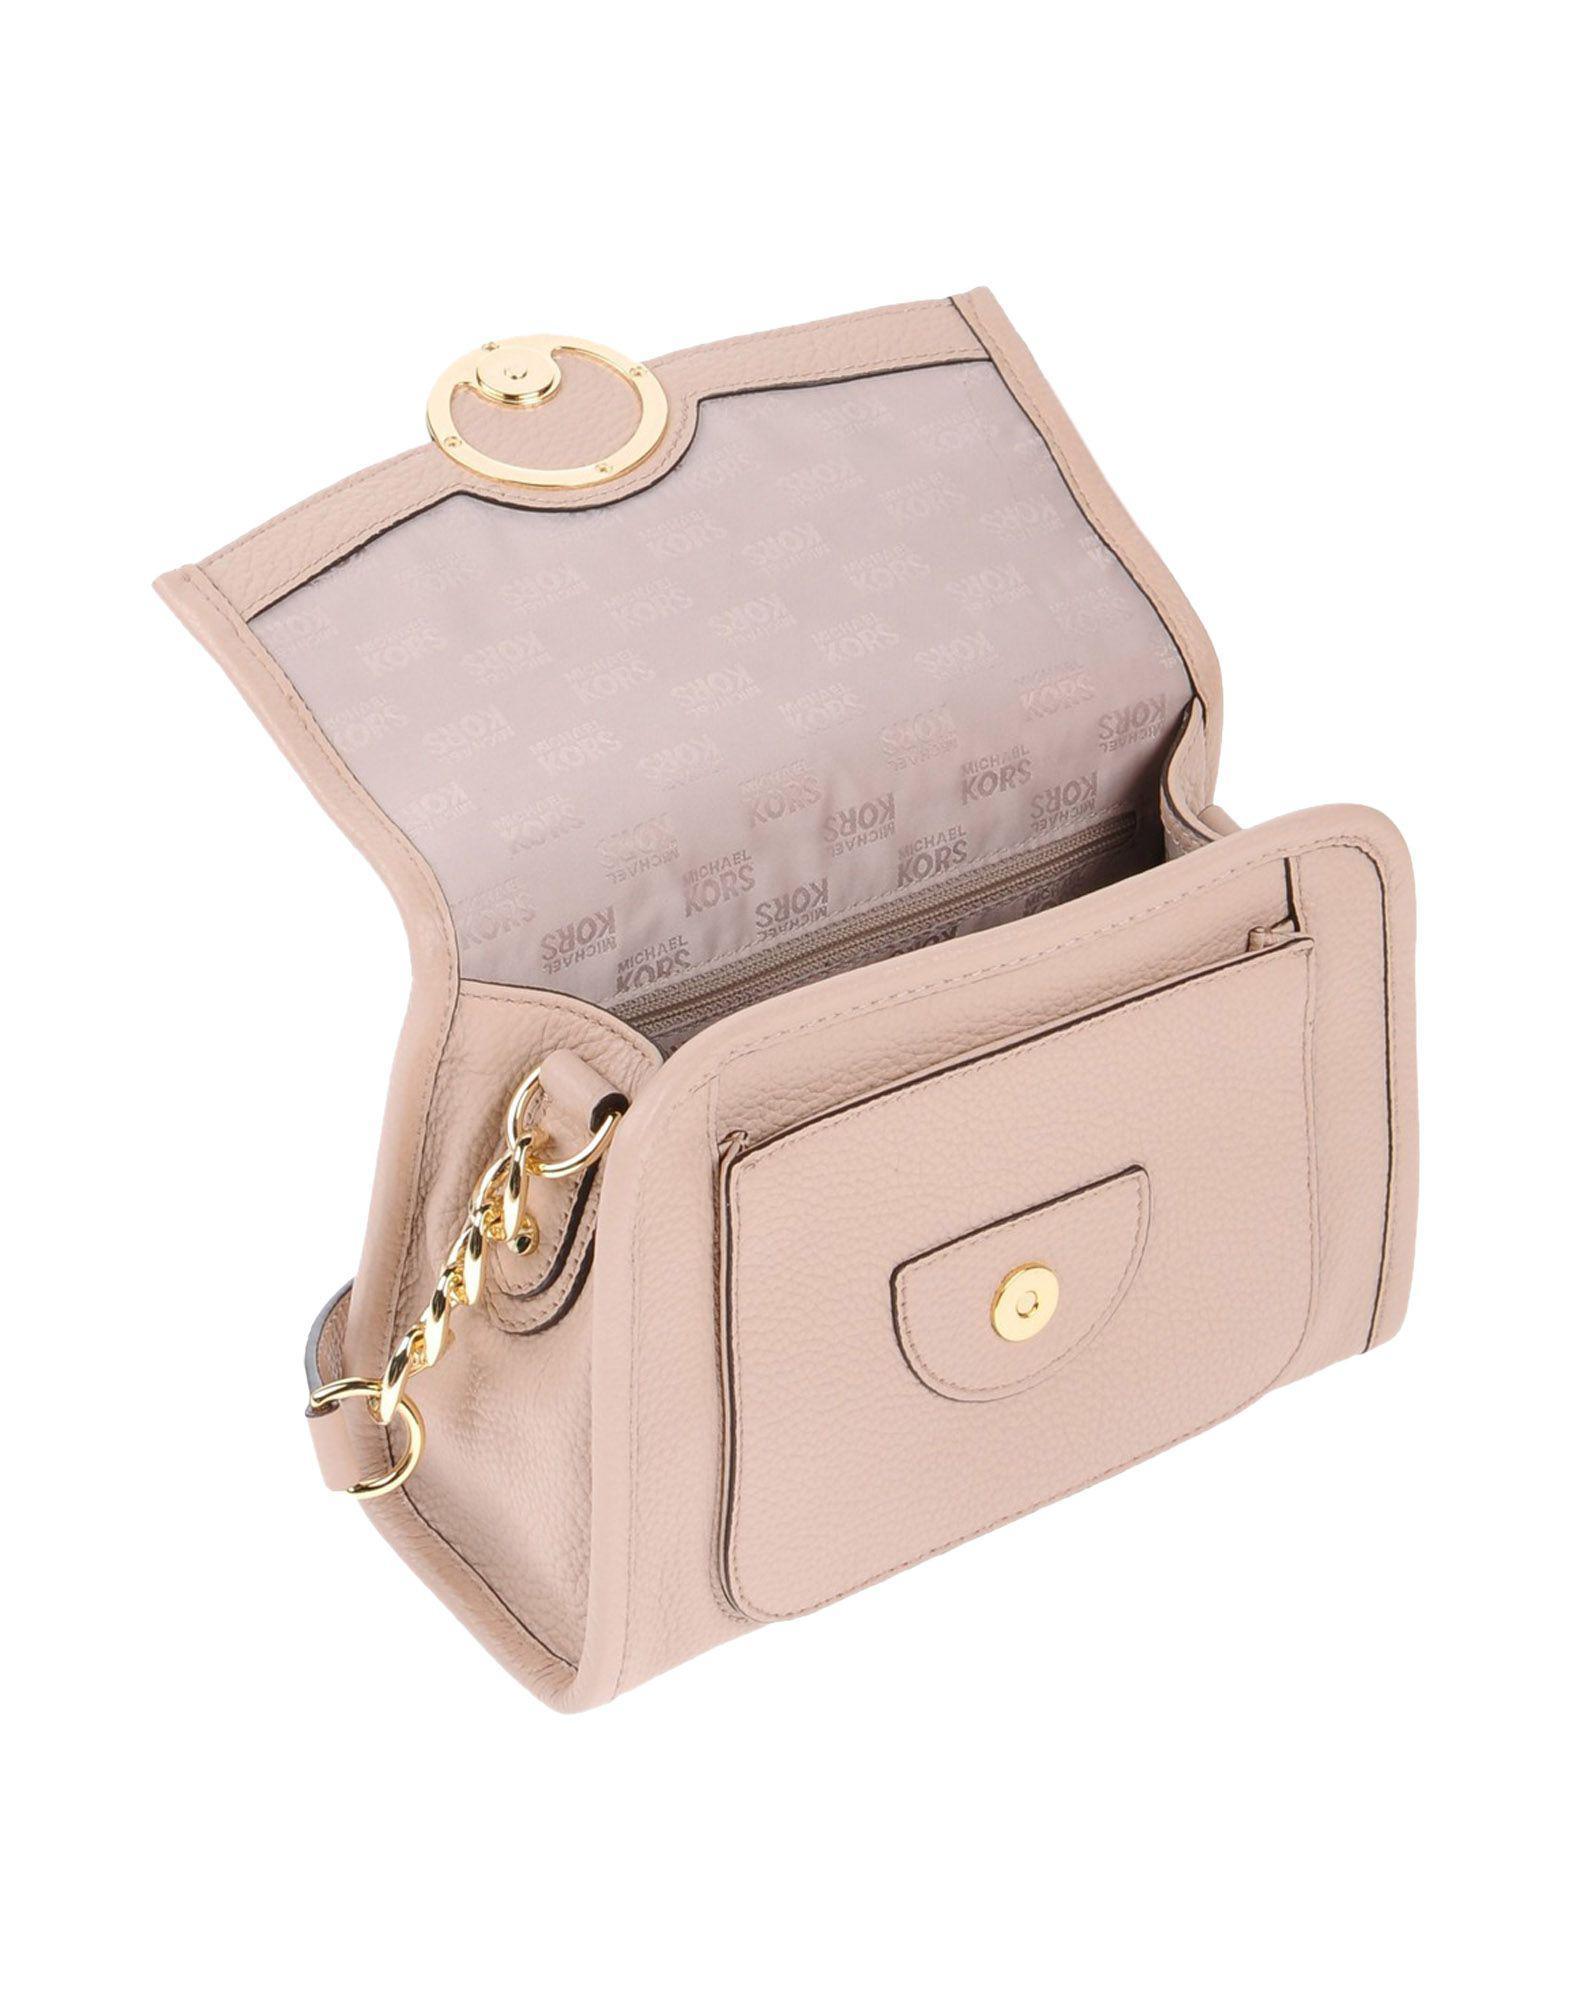 MICHAEL Michael Kors Leather Cross-body Bag in Pink